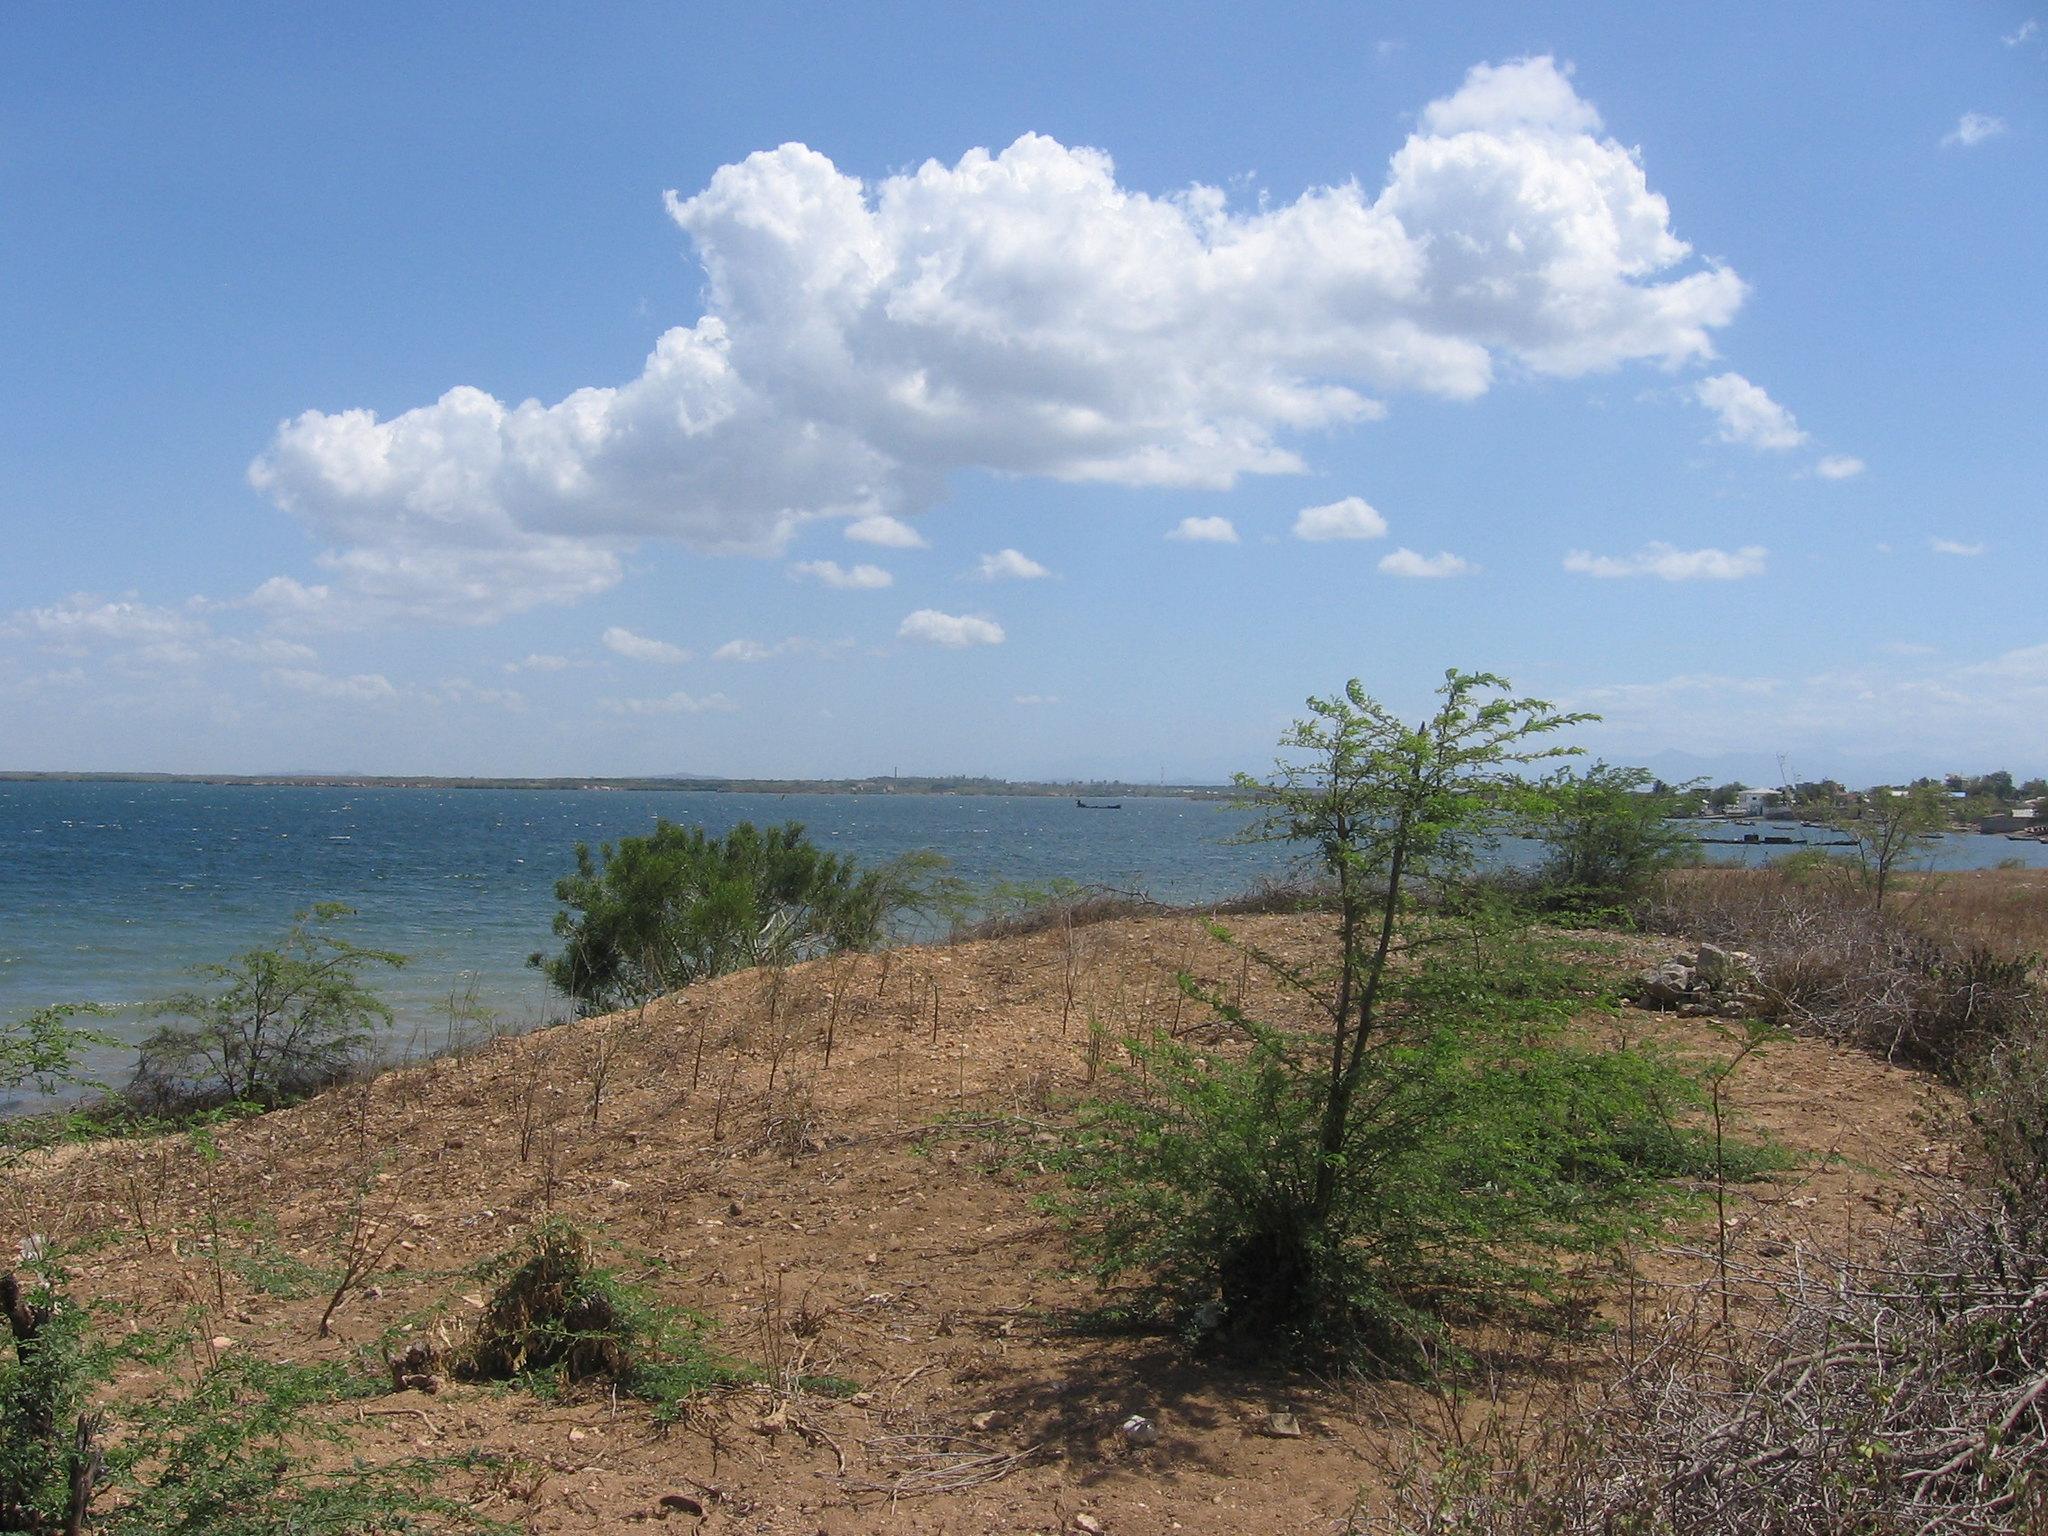 Deforested area from the coast, Haiti